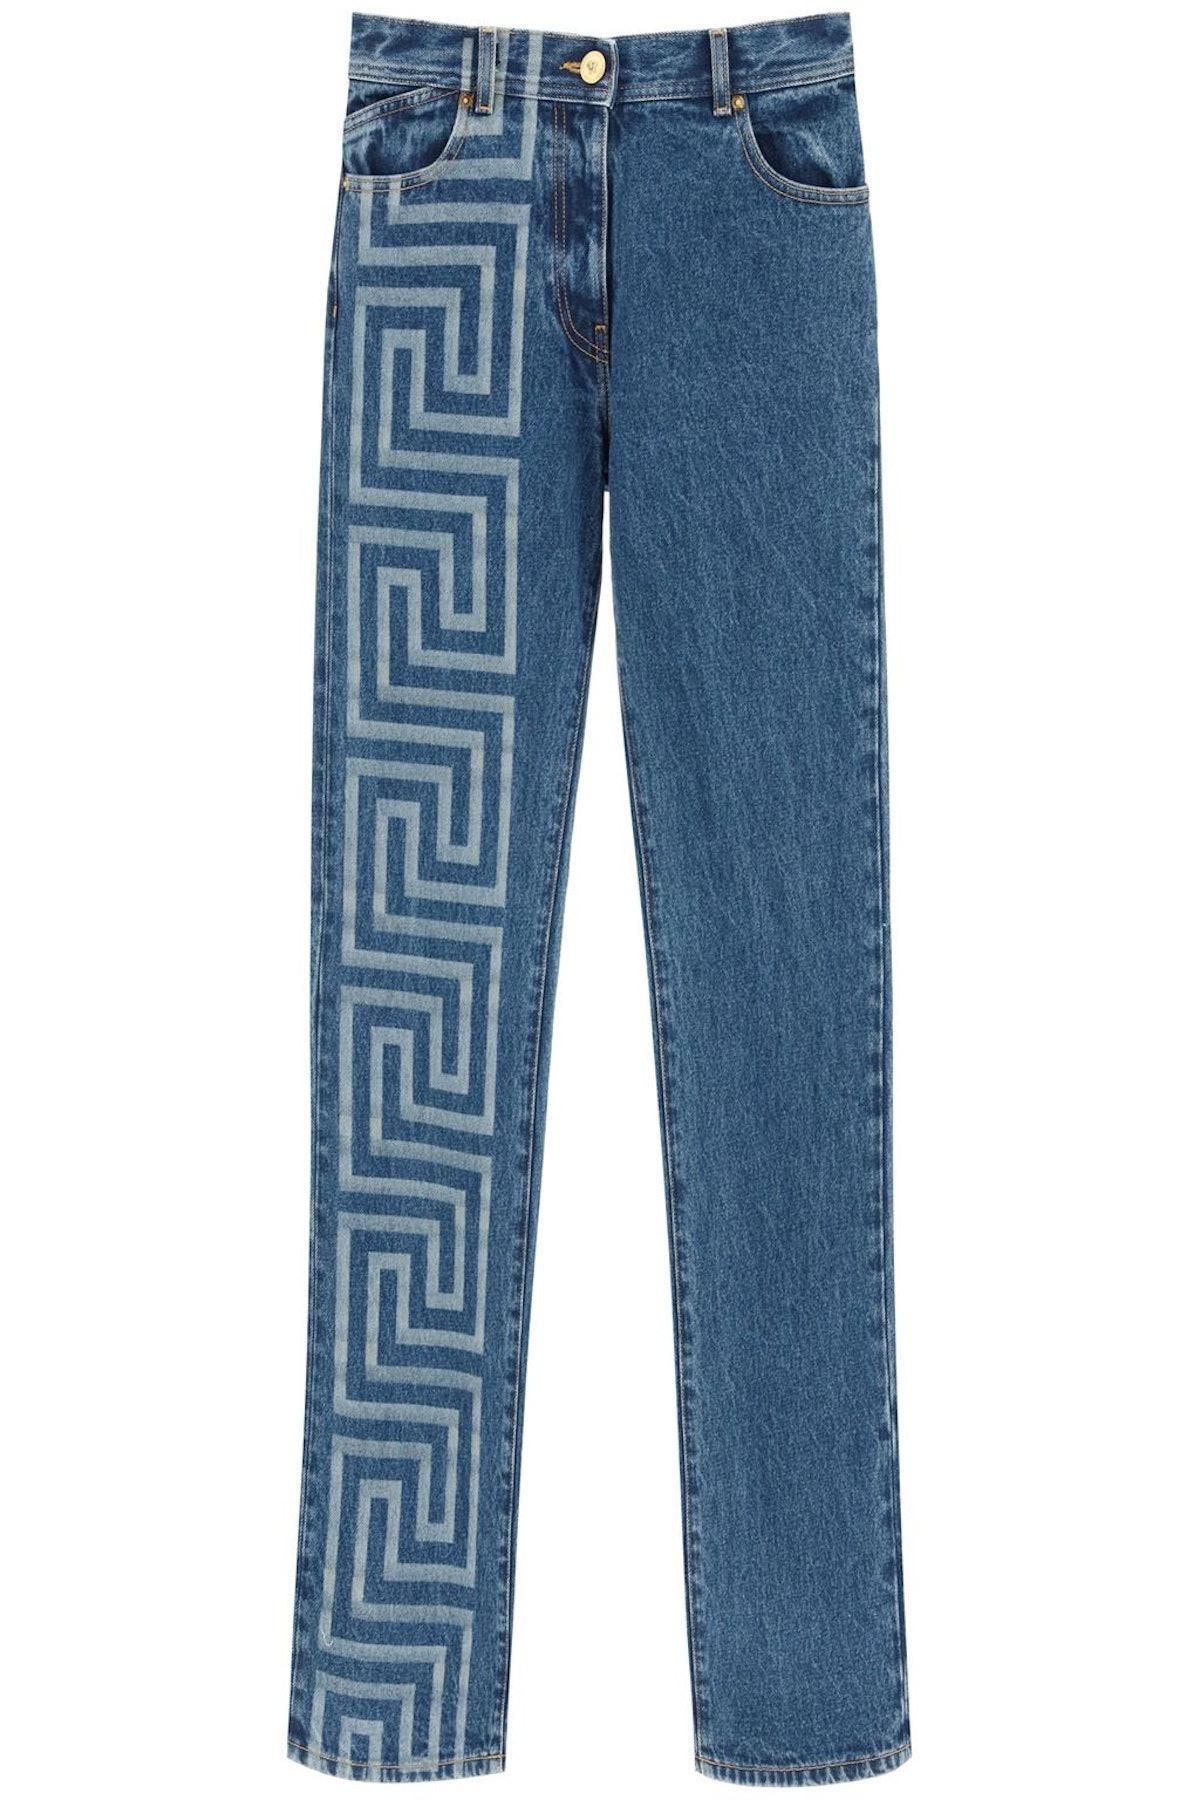 Versace Greca Print Wide Leg Jeans: image 1